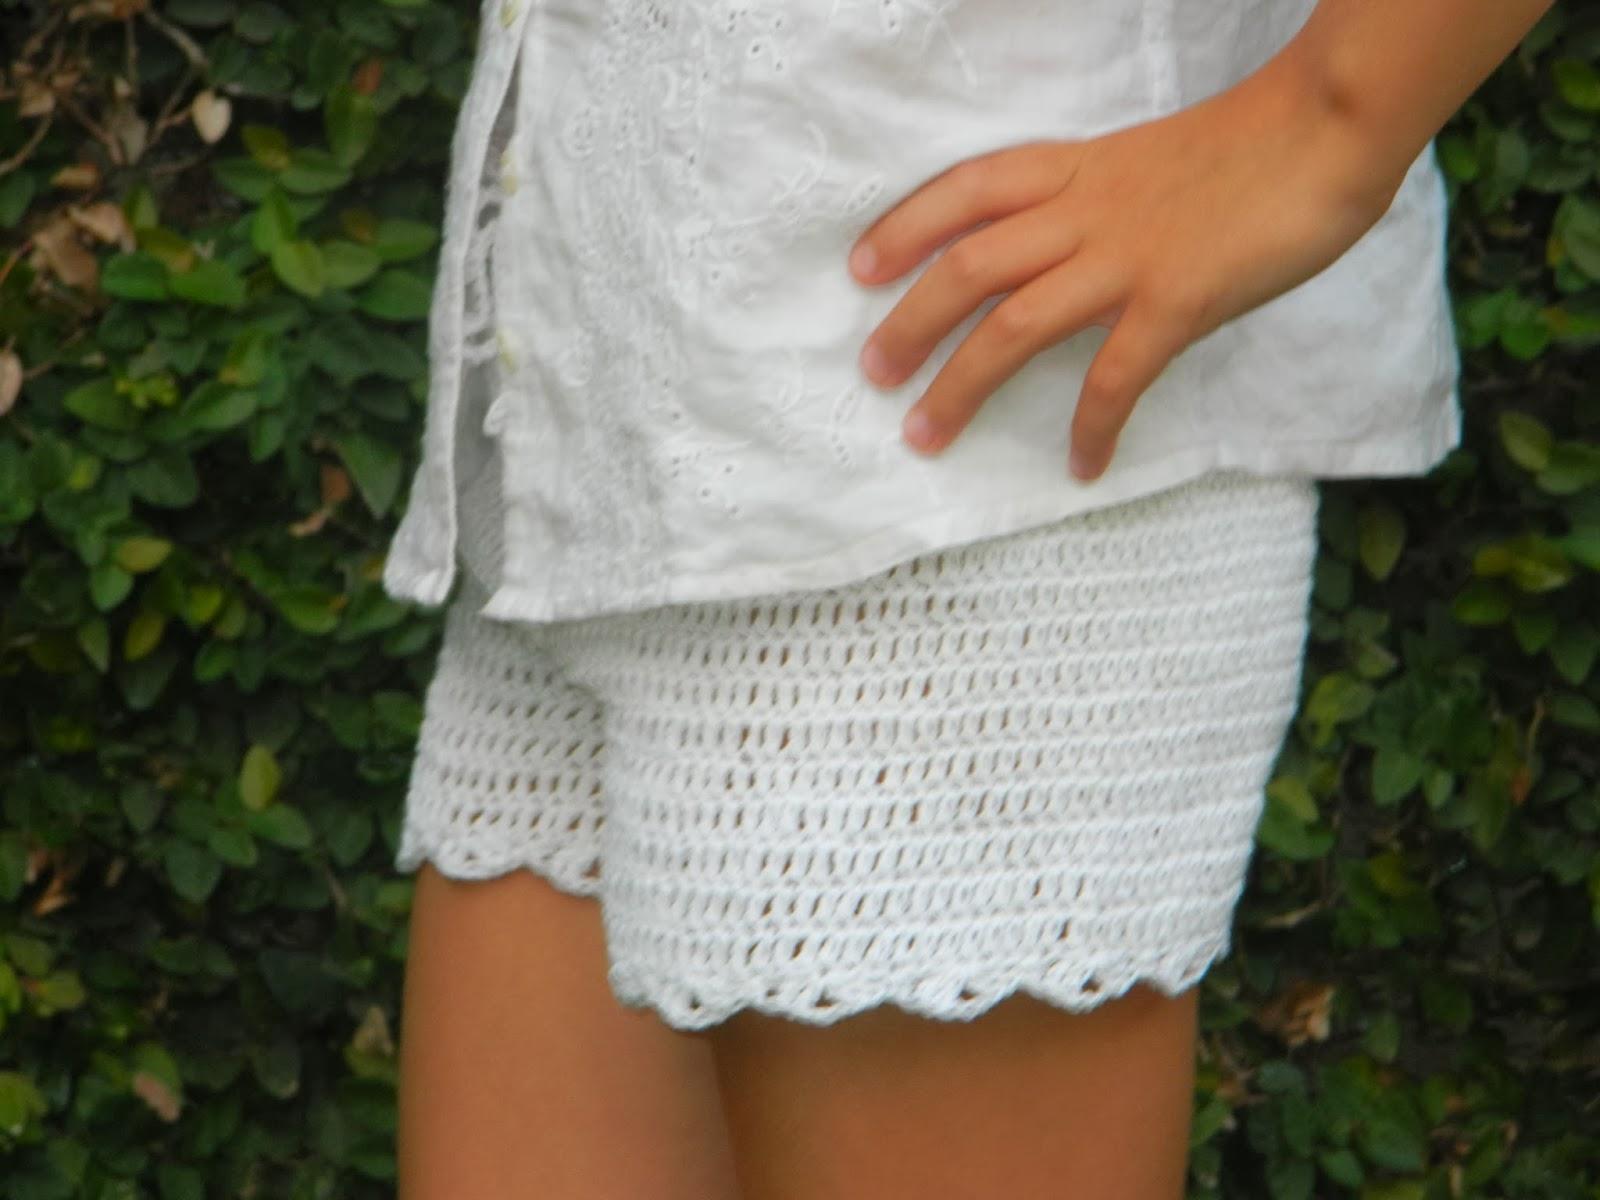 Tejiendo & Pensando: shorts a crochet